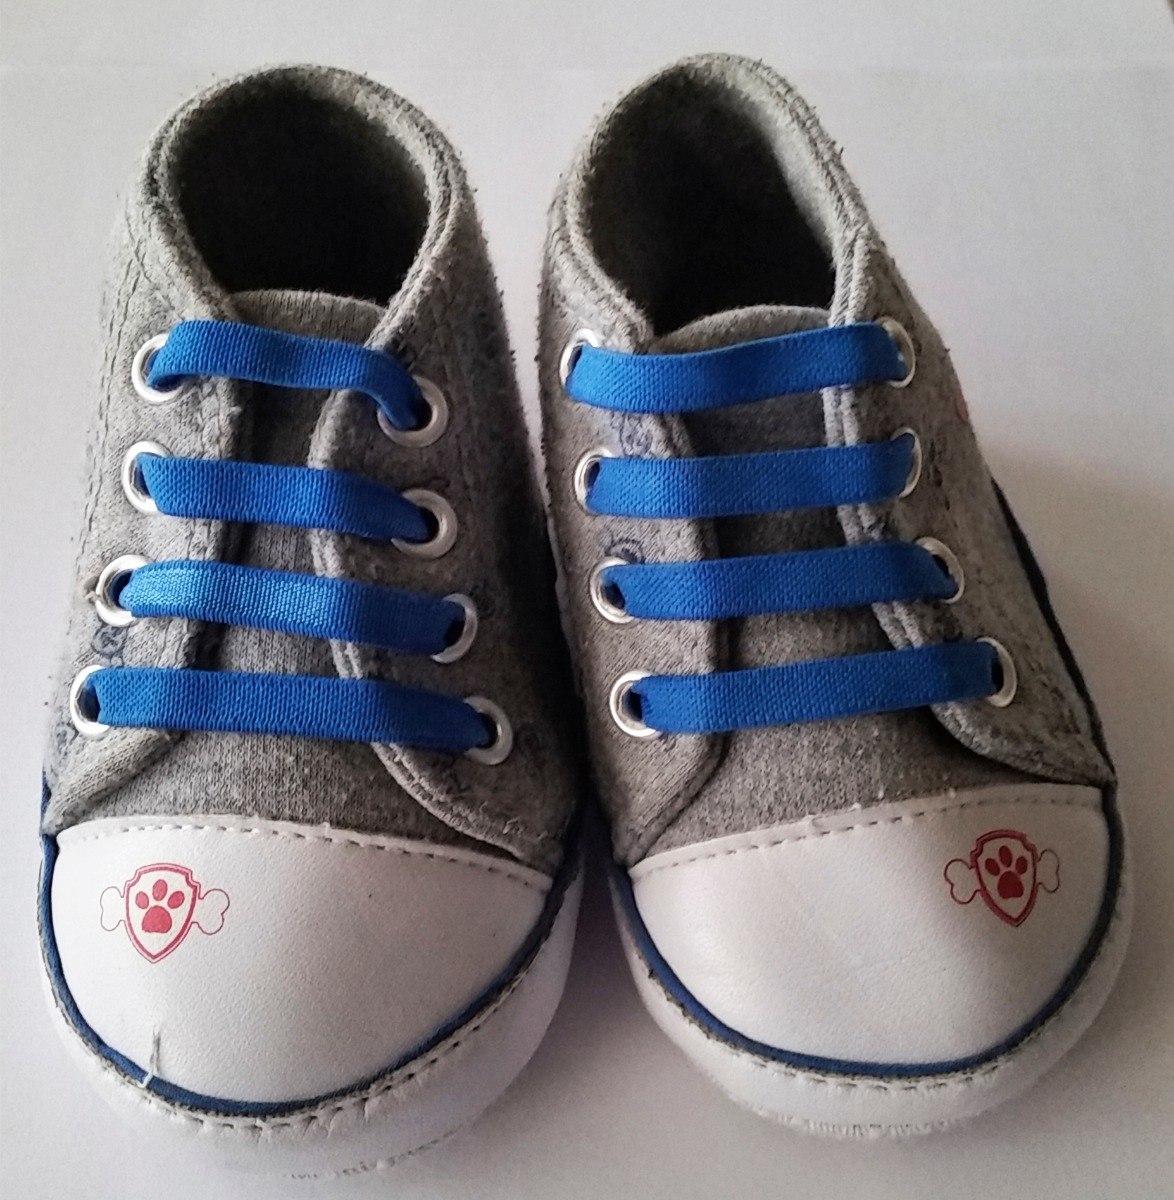 268afd88208 zapato bebe patrulla canina niño talla 18. Cargando zoom.